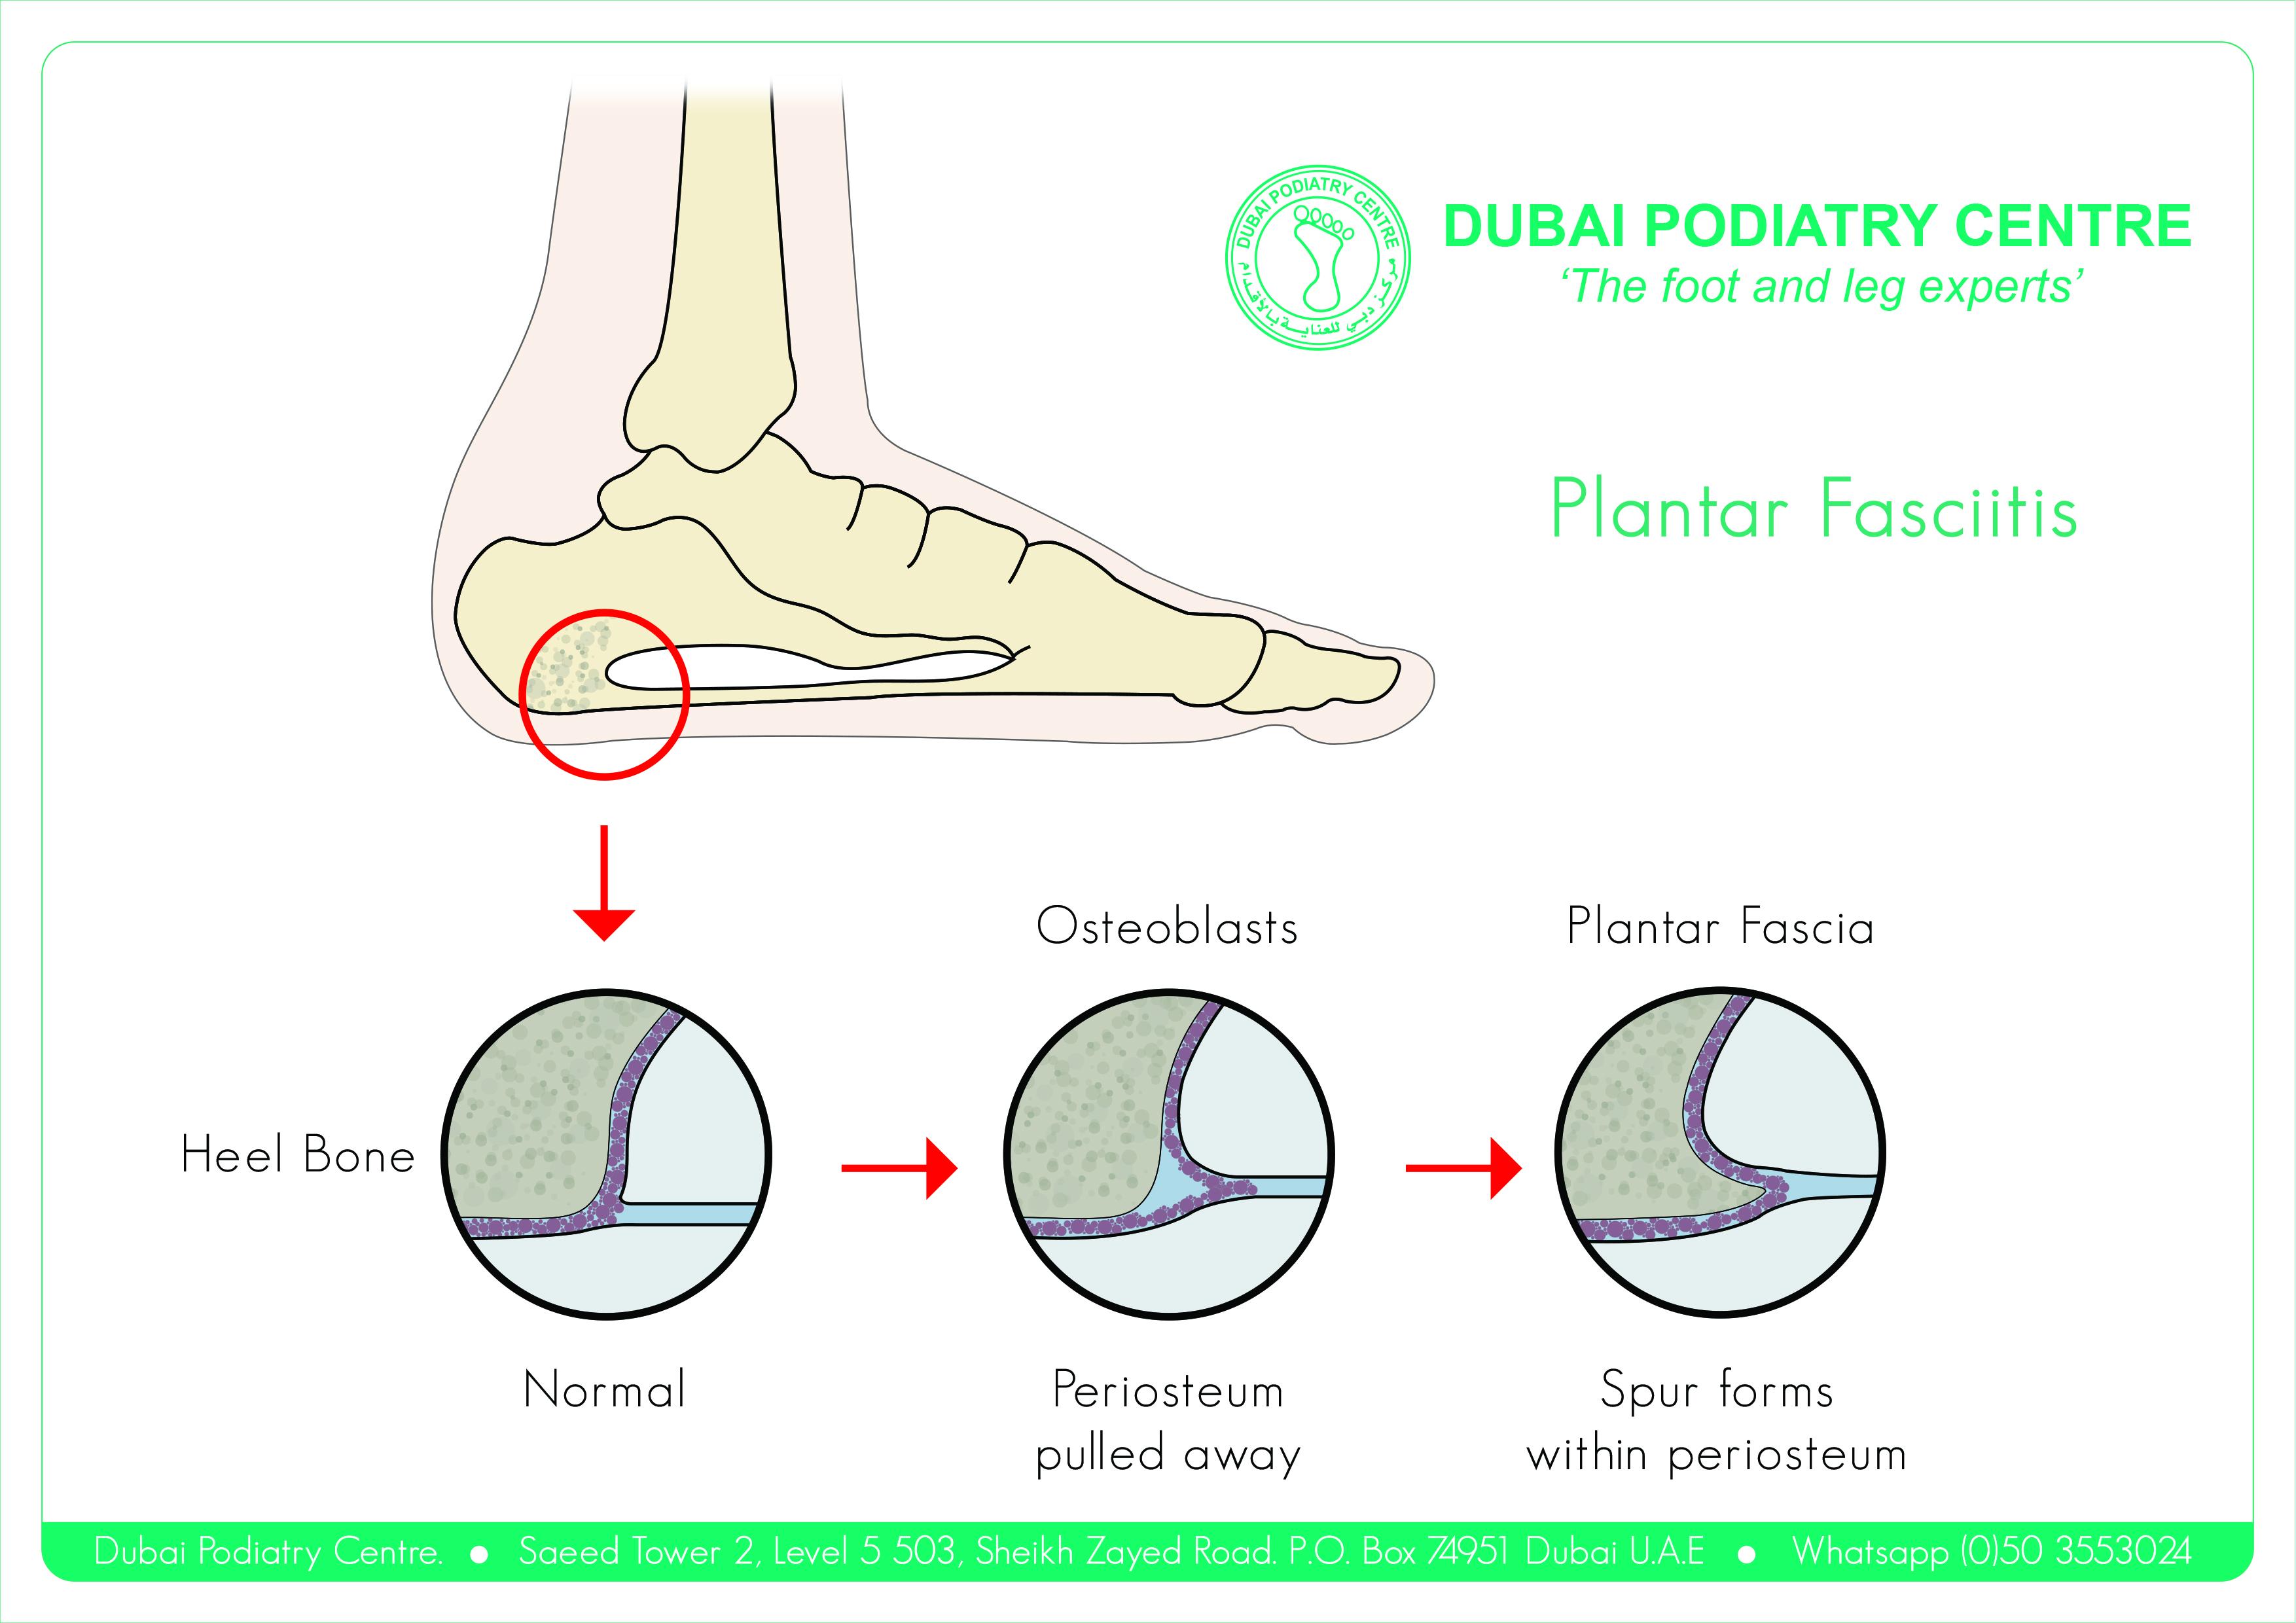 http://dubaipodiatry.com/wp-content/uploads/2018/04/Plantar-Fascia_Front.jpg